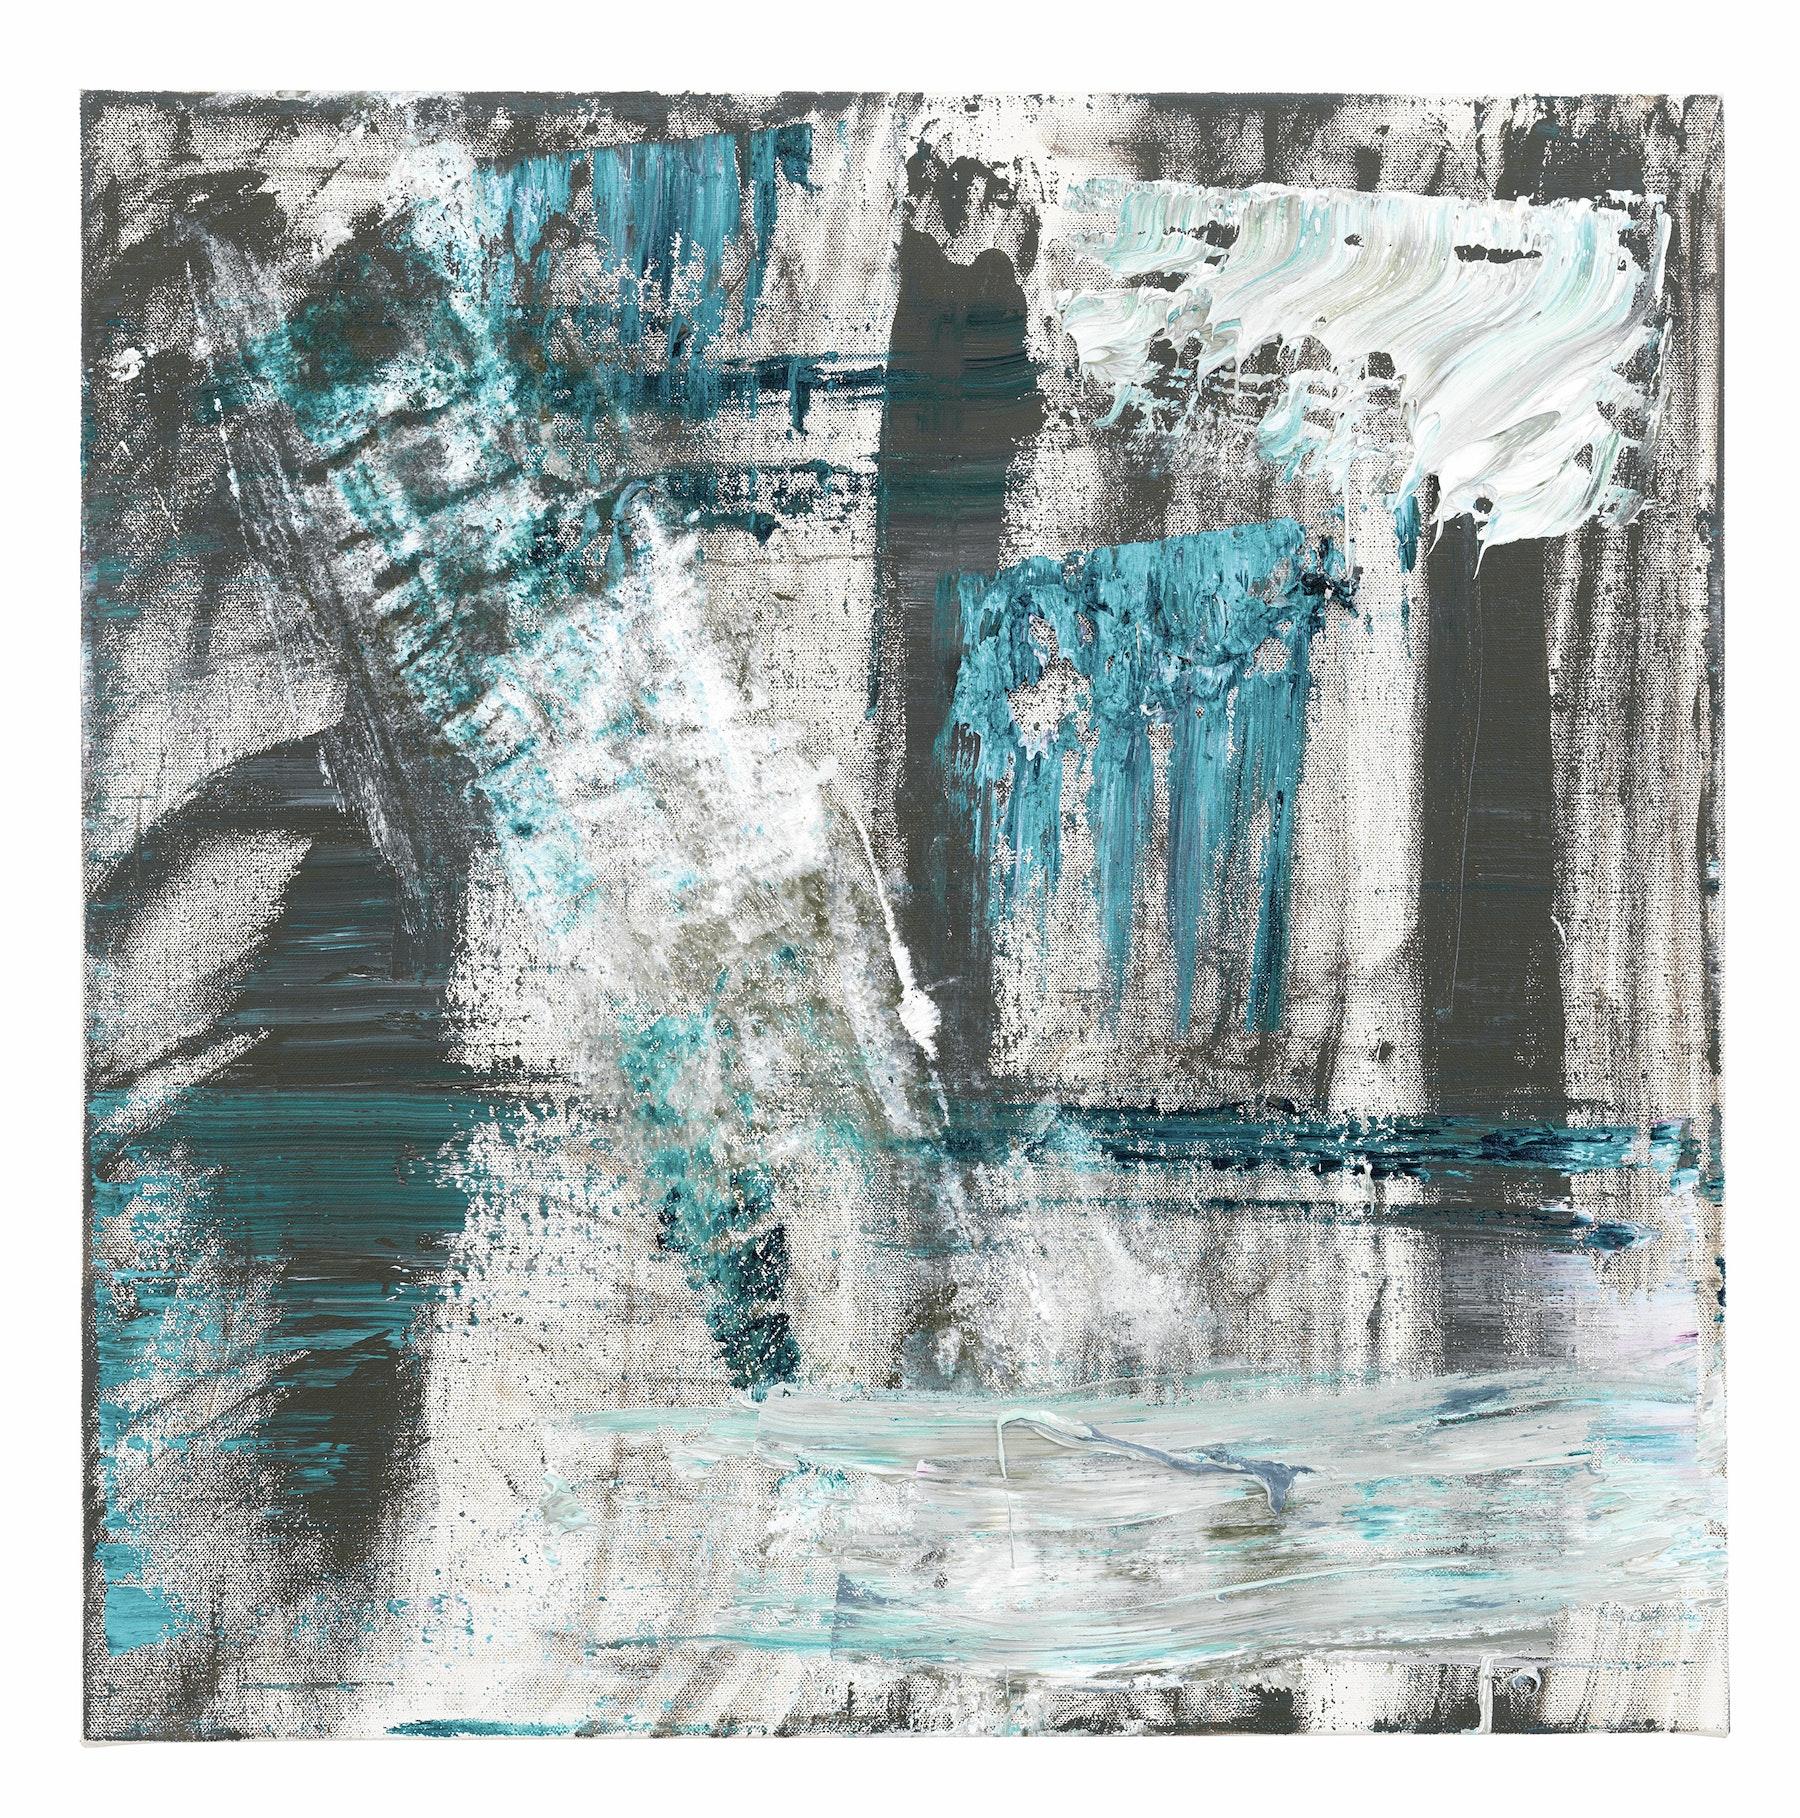 "Louise Fishman ""JASPER,"" 2016 Oil on linen 30 x 30"" [HxW] (76.2 x 76.2 cm) Inventory #FIS158 Courtesy of the artist and Vielmetter Los Angeles"